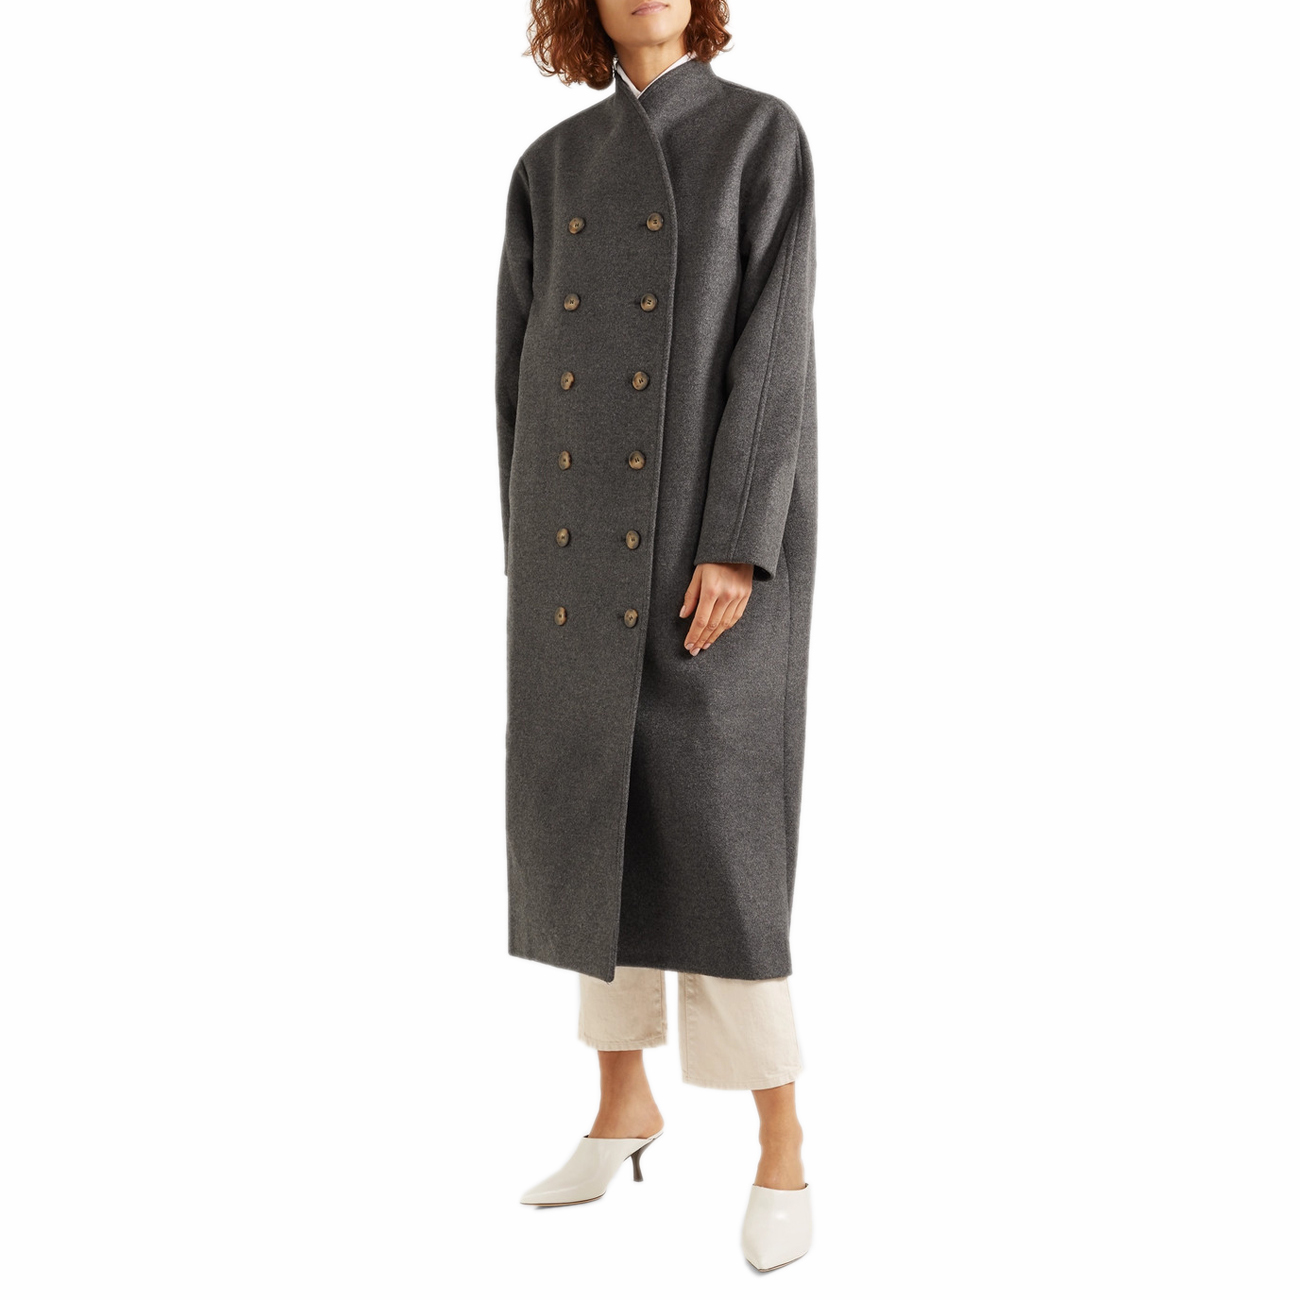 701c444b56f9 Women Toteme Bergerac Wool Coat Gray Melange Double Breasted Jacket